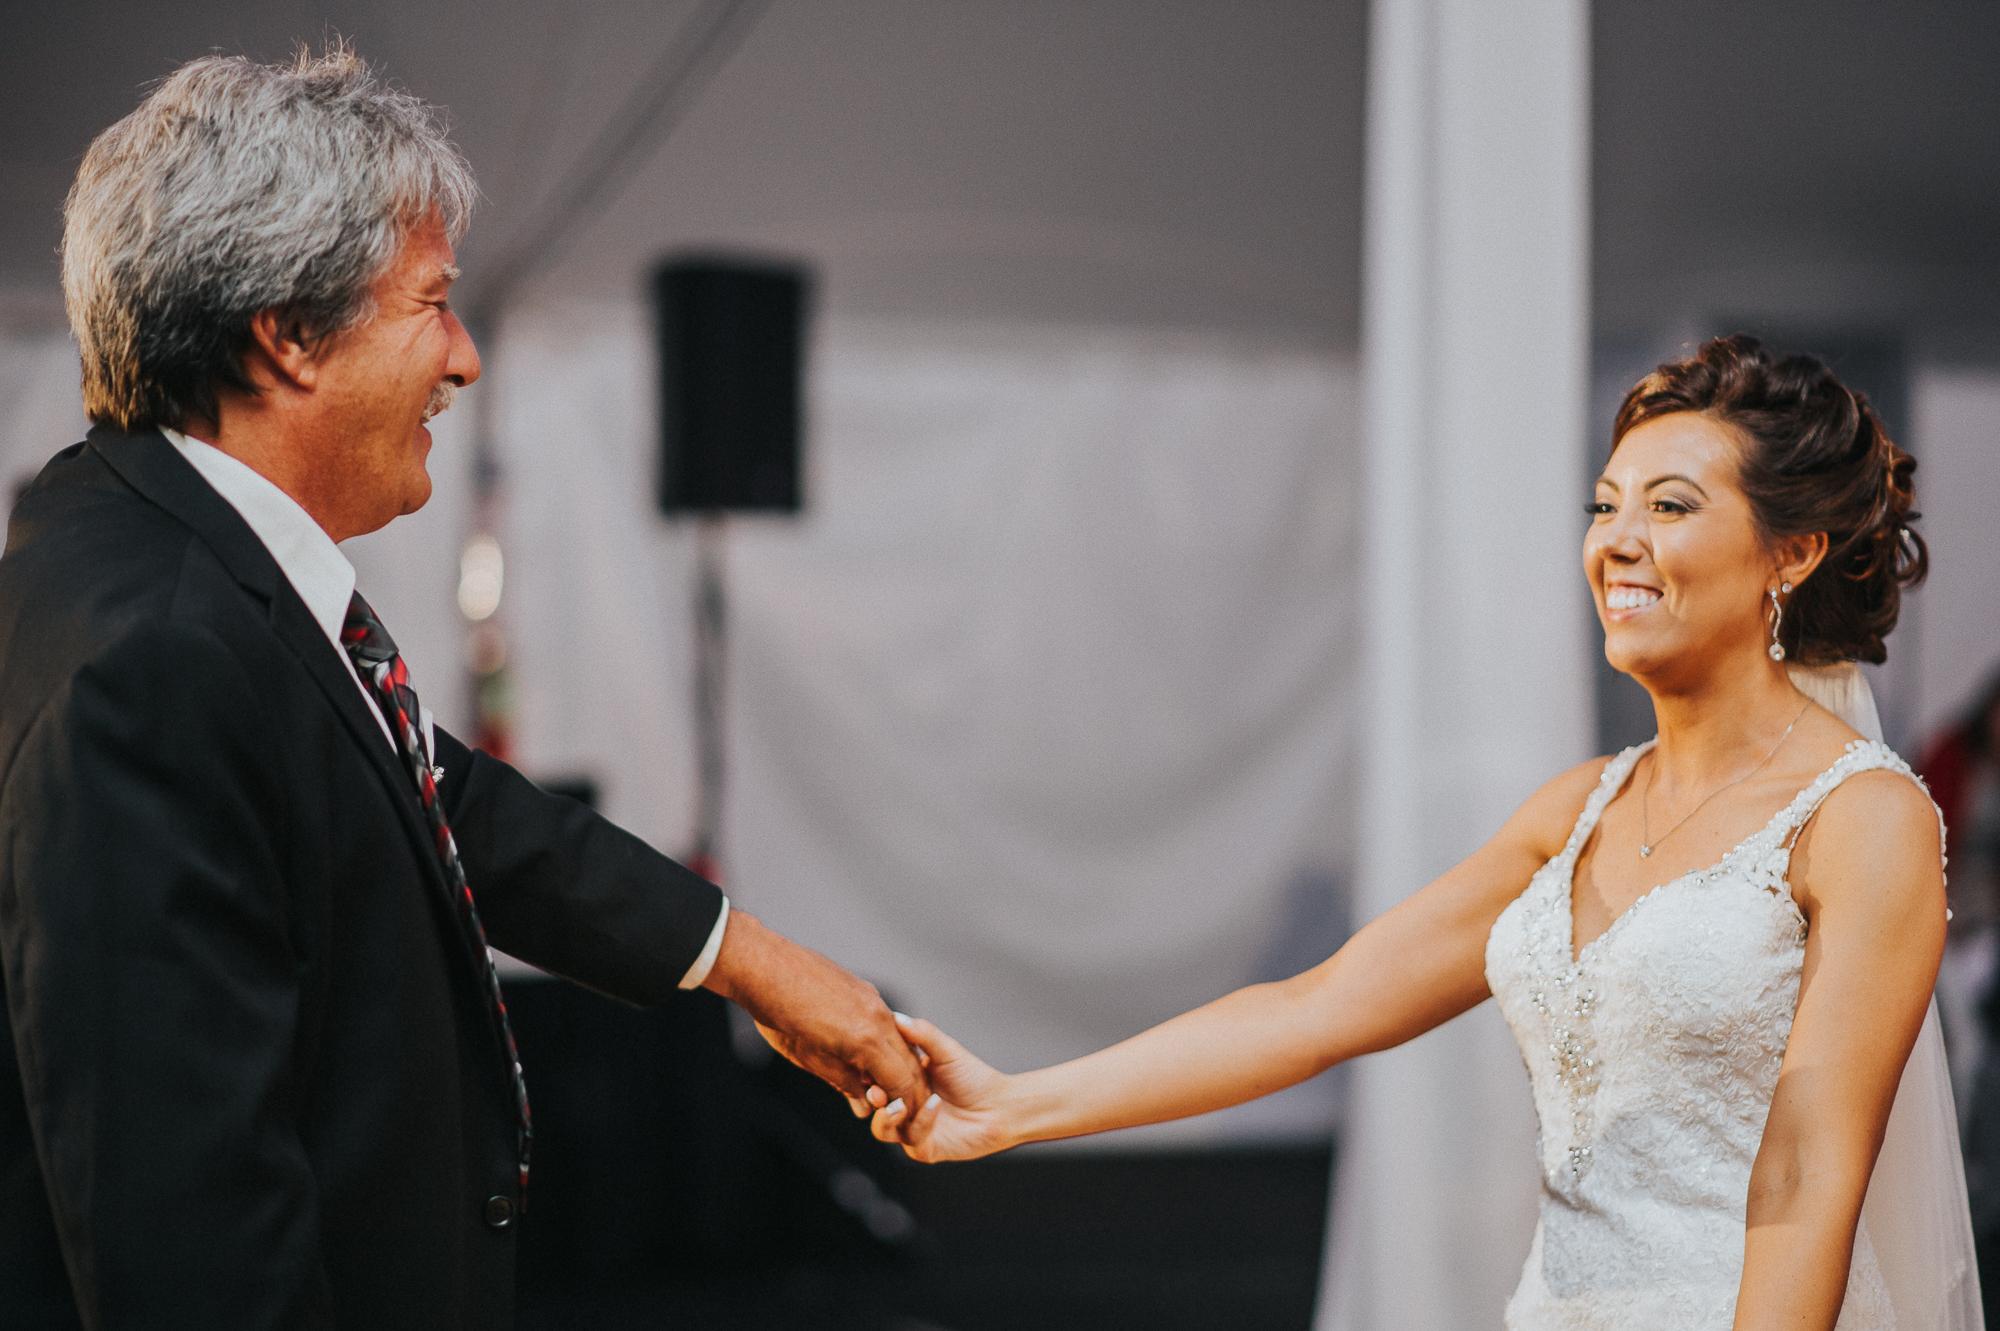 Christina-and-Gene-Wedding-Marla-Rain-Photography-550.jpg